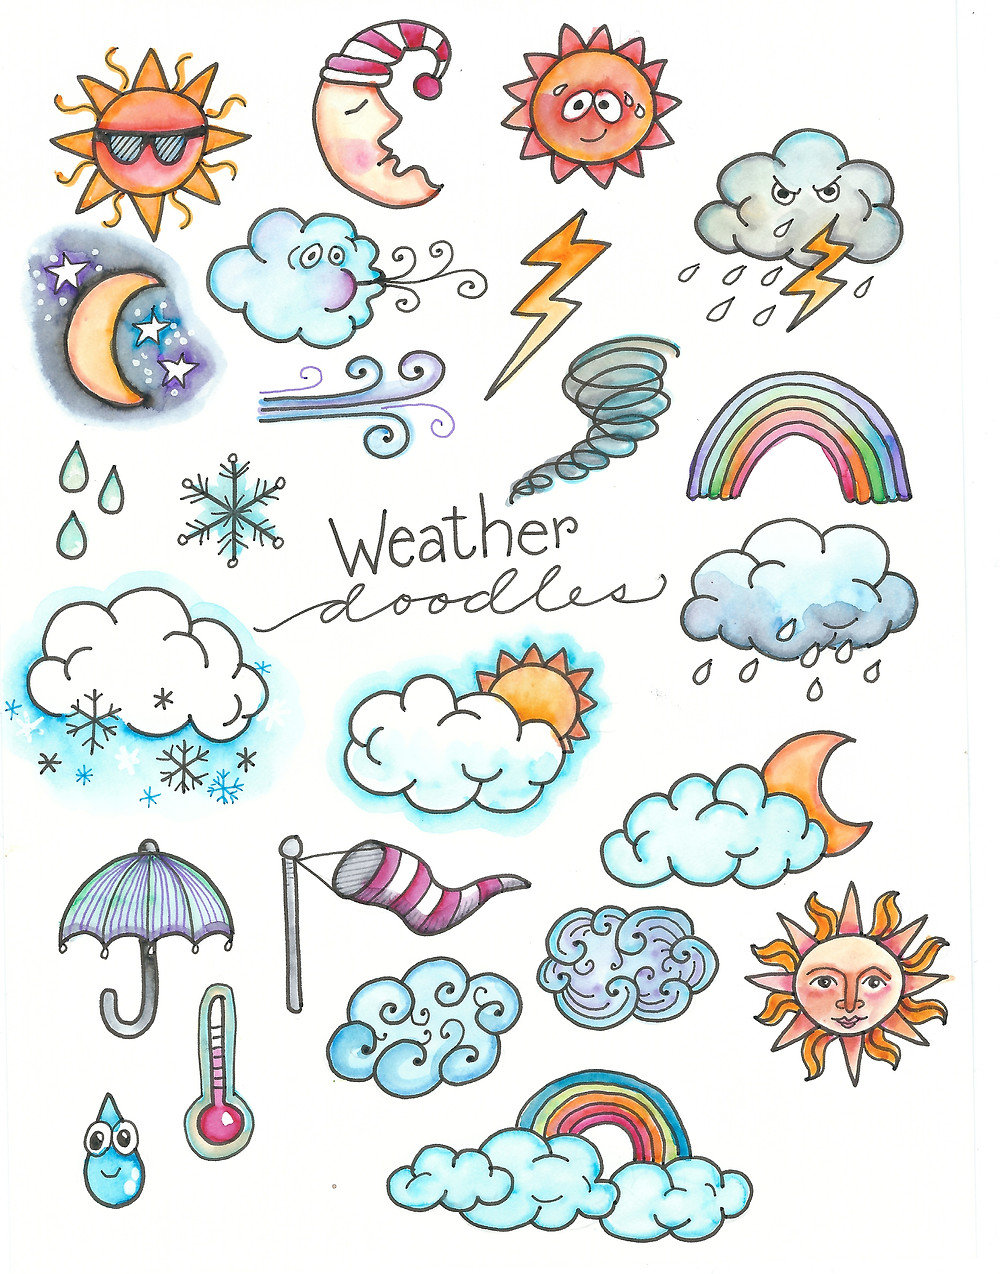 @mariebcreates #tombowusa #doodles #plannerlove Weather Journal Doodles